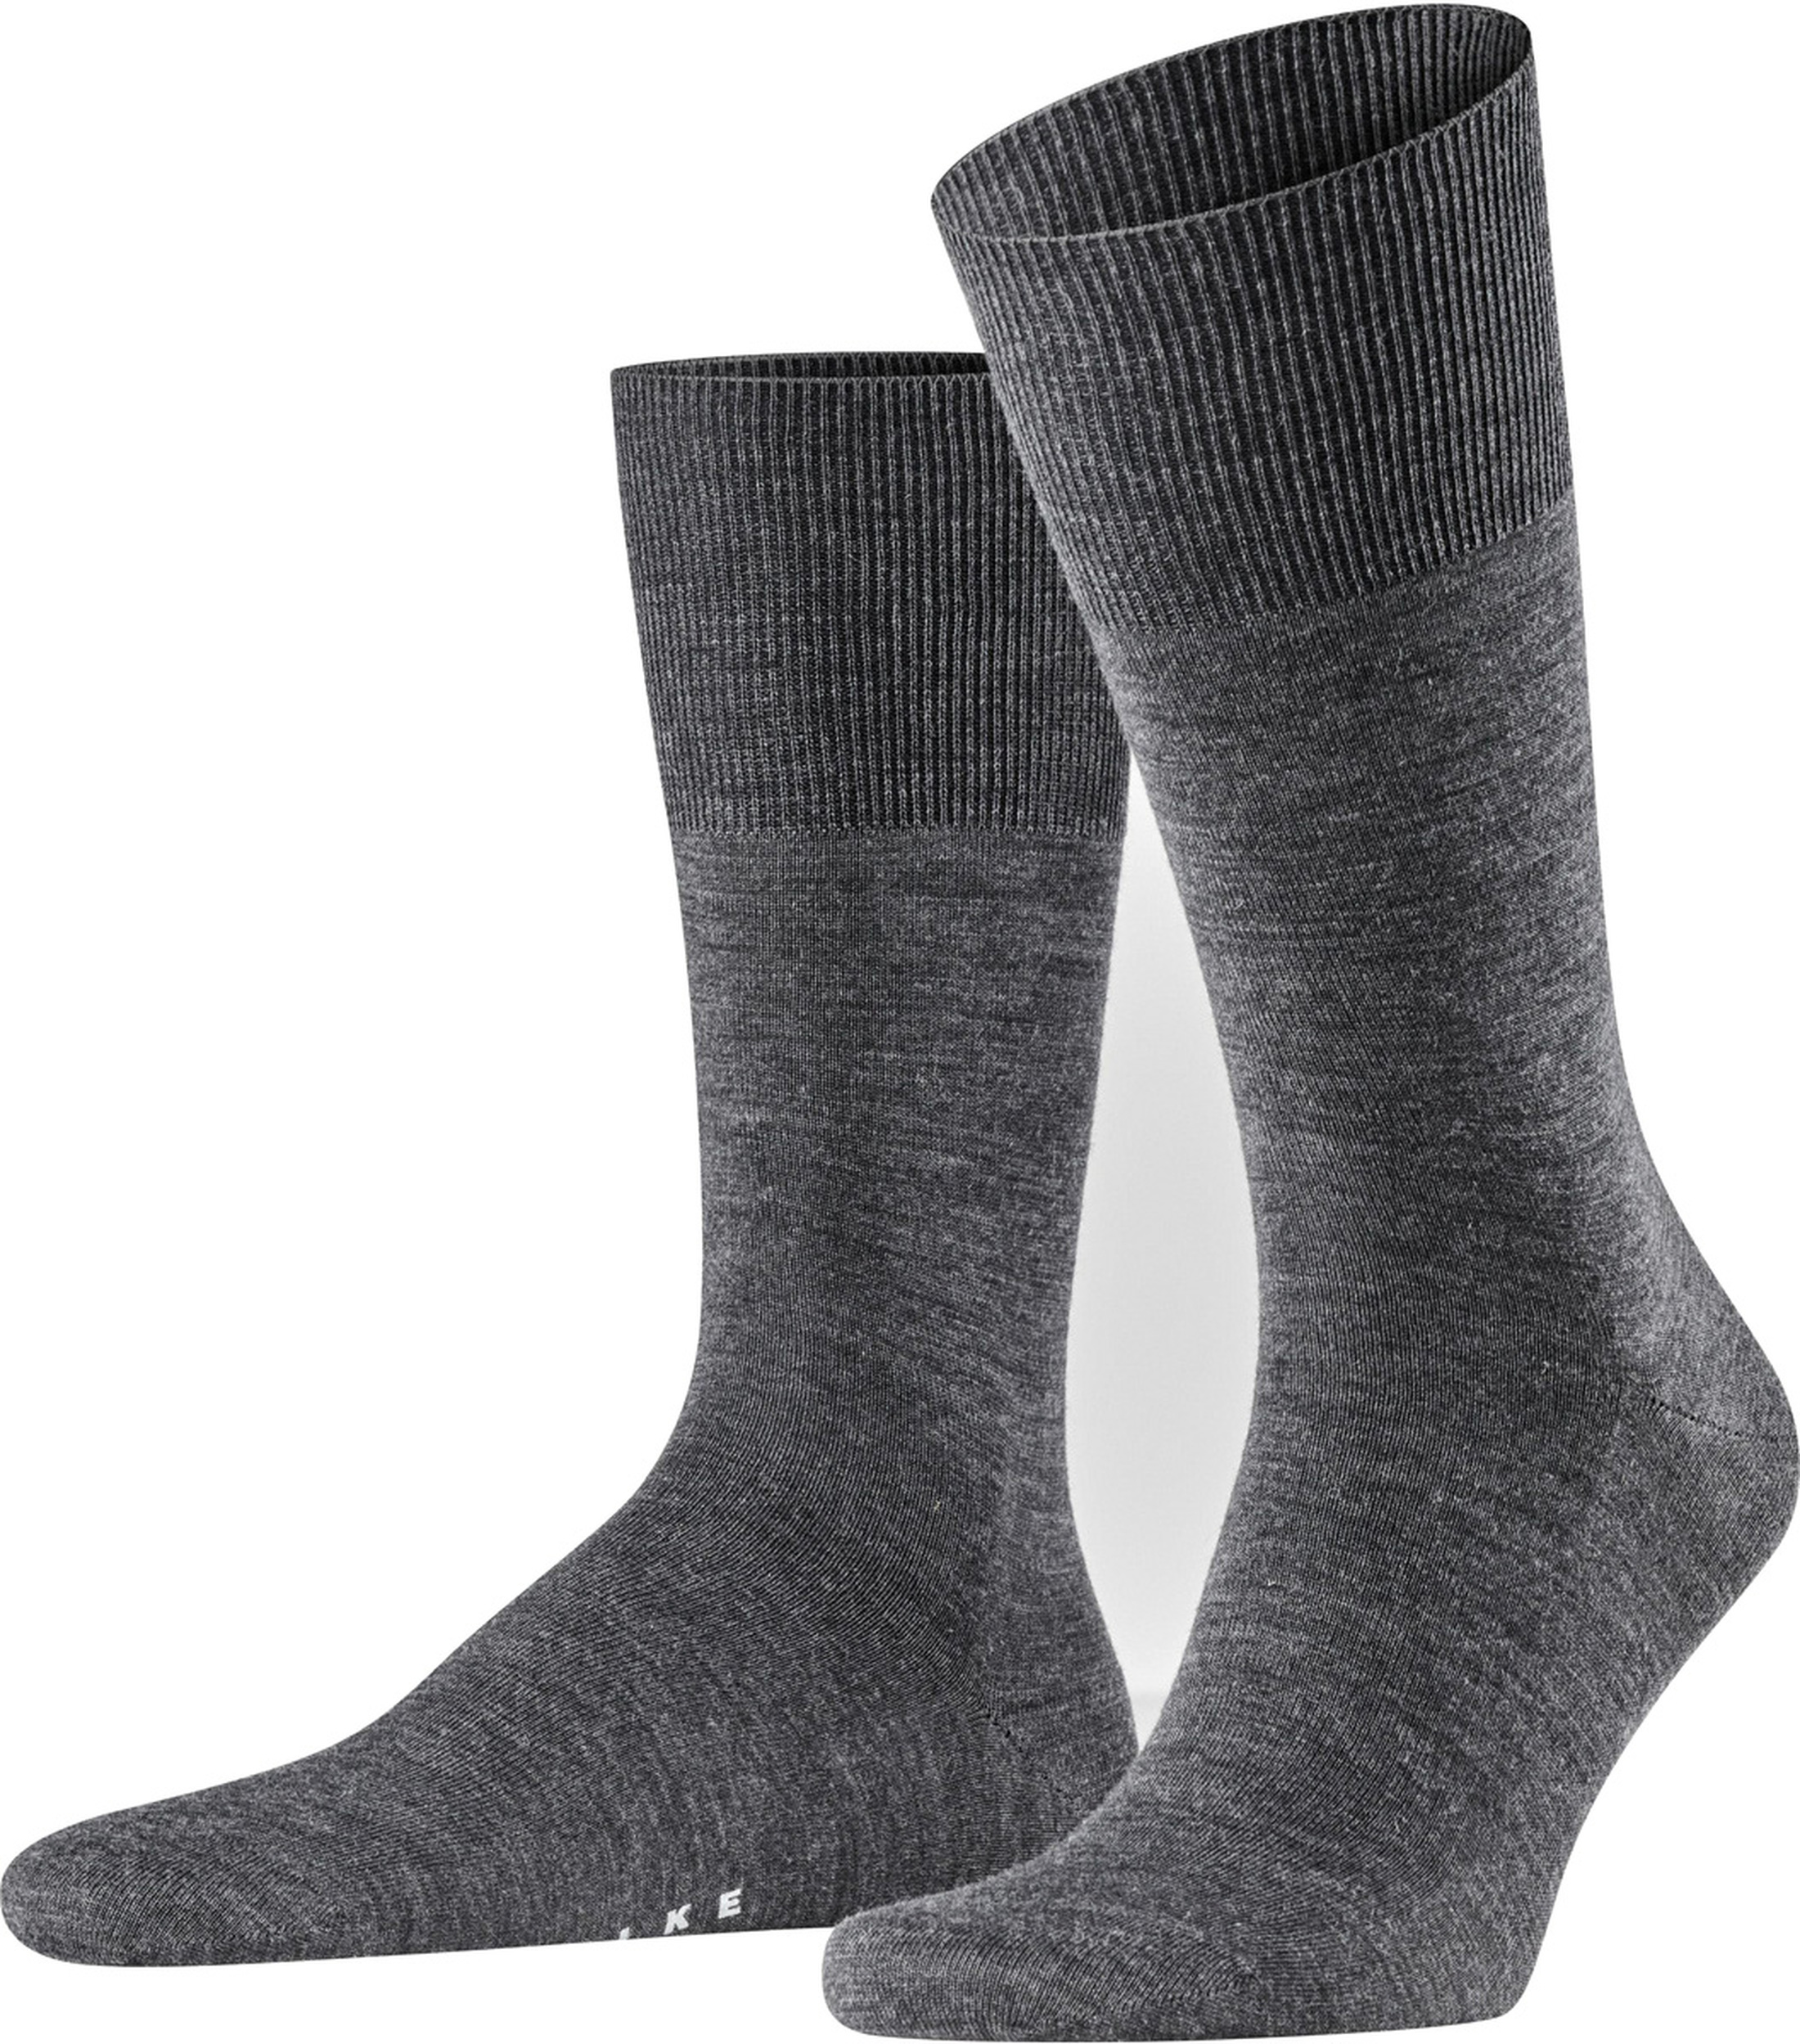 Falke Airport Socks Asphalt 3180